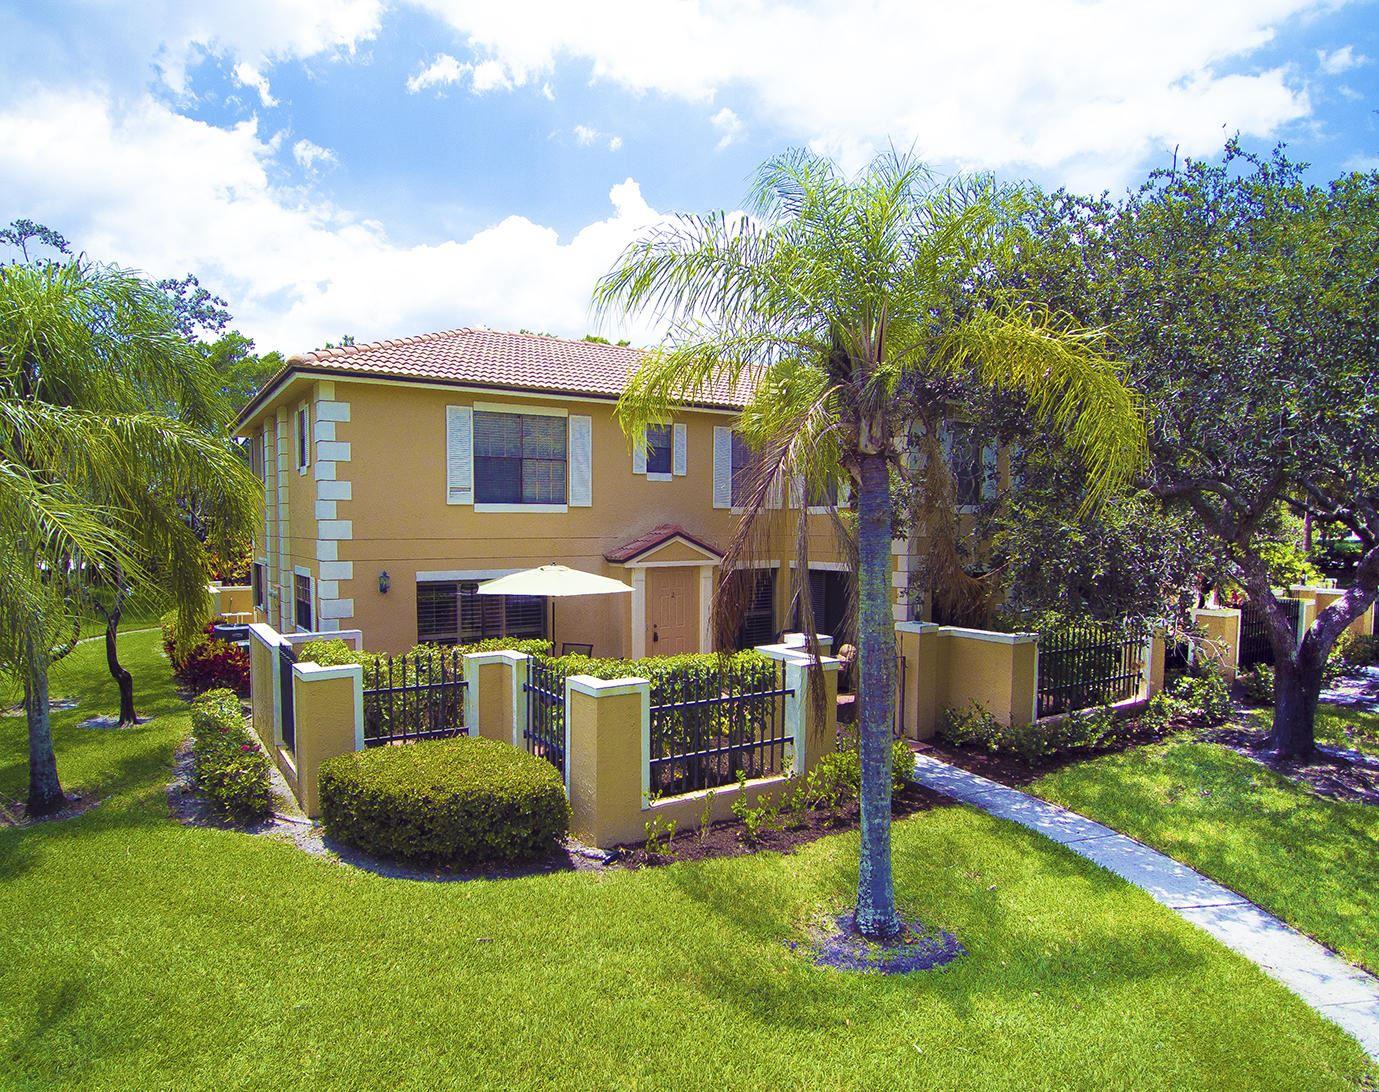 Photo of 377 Prestwick Lane #2, Palm Beach Gardens, FL 33418 (MLS # RX-10639953)